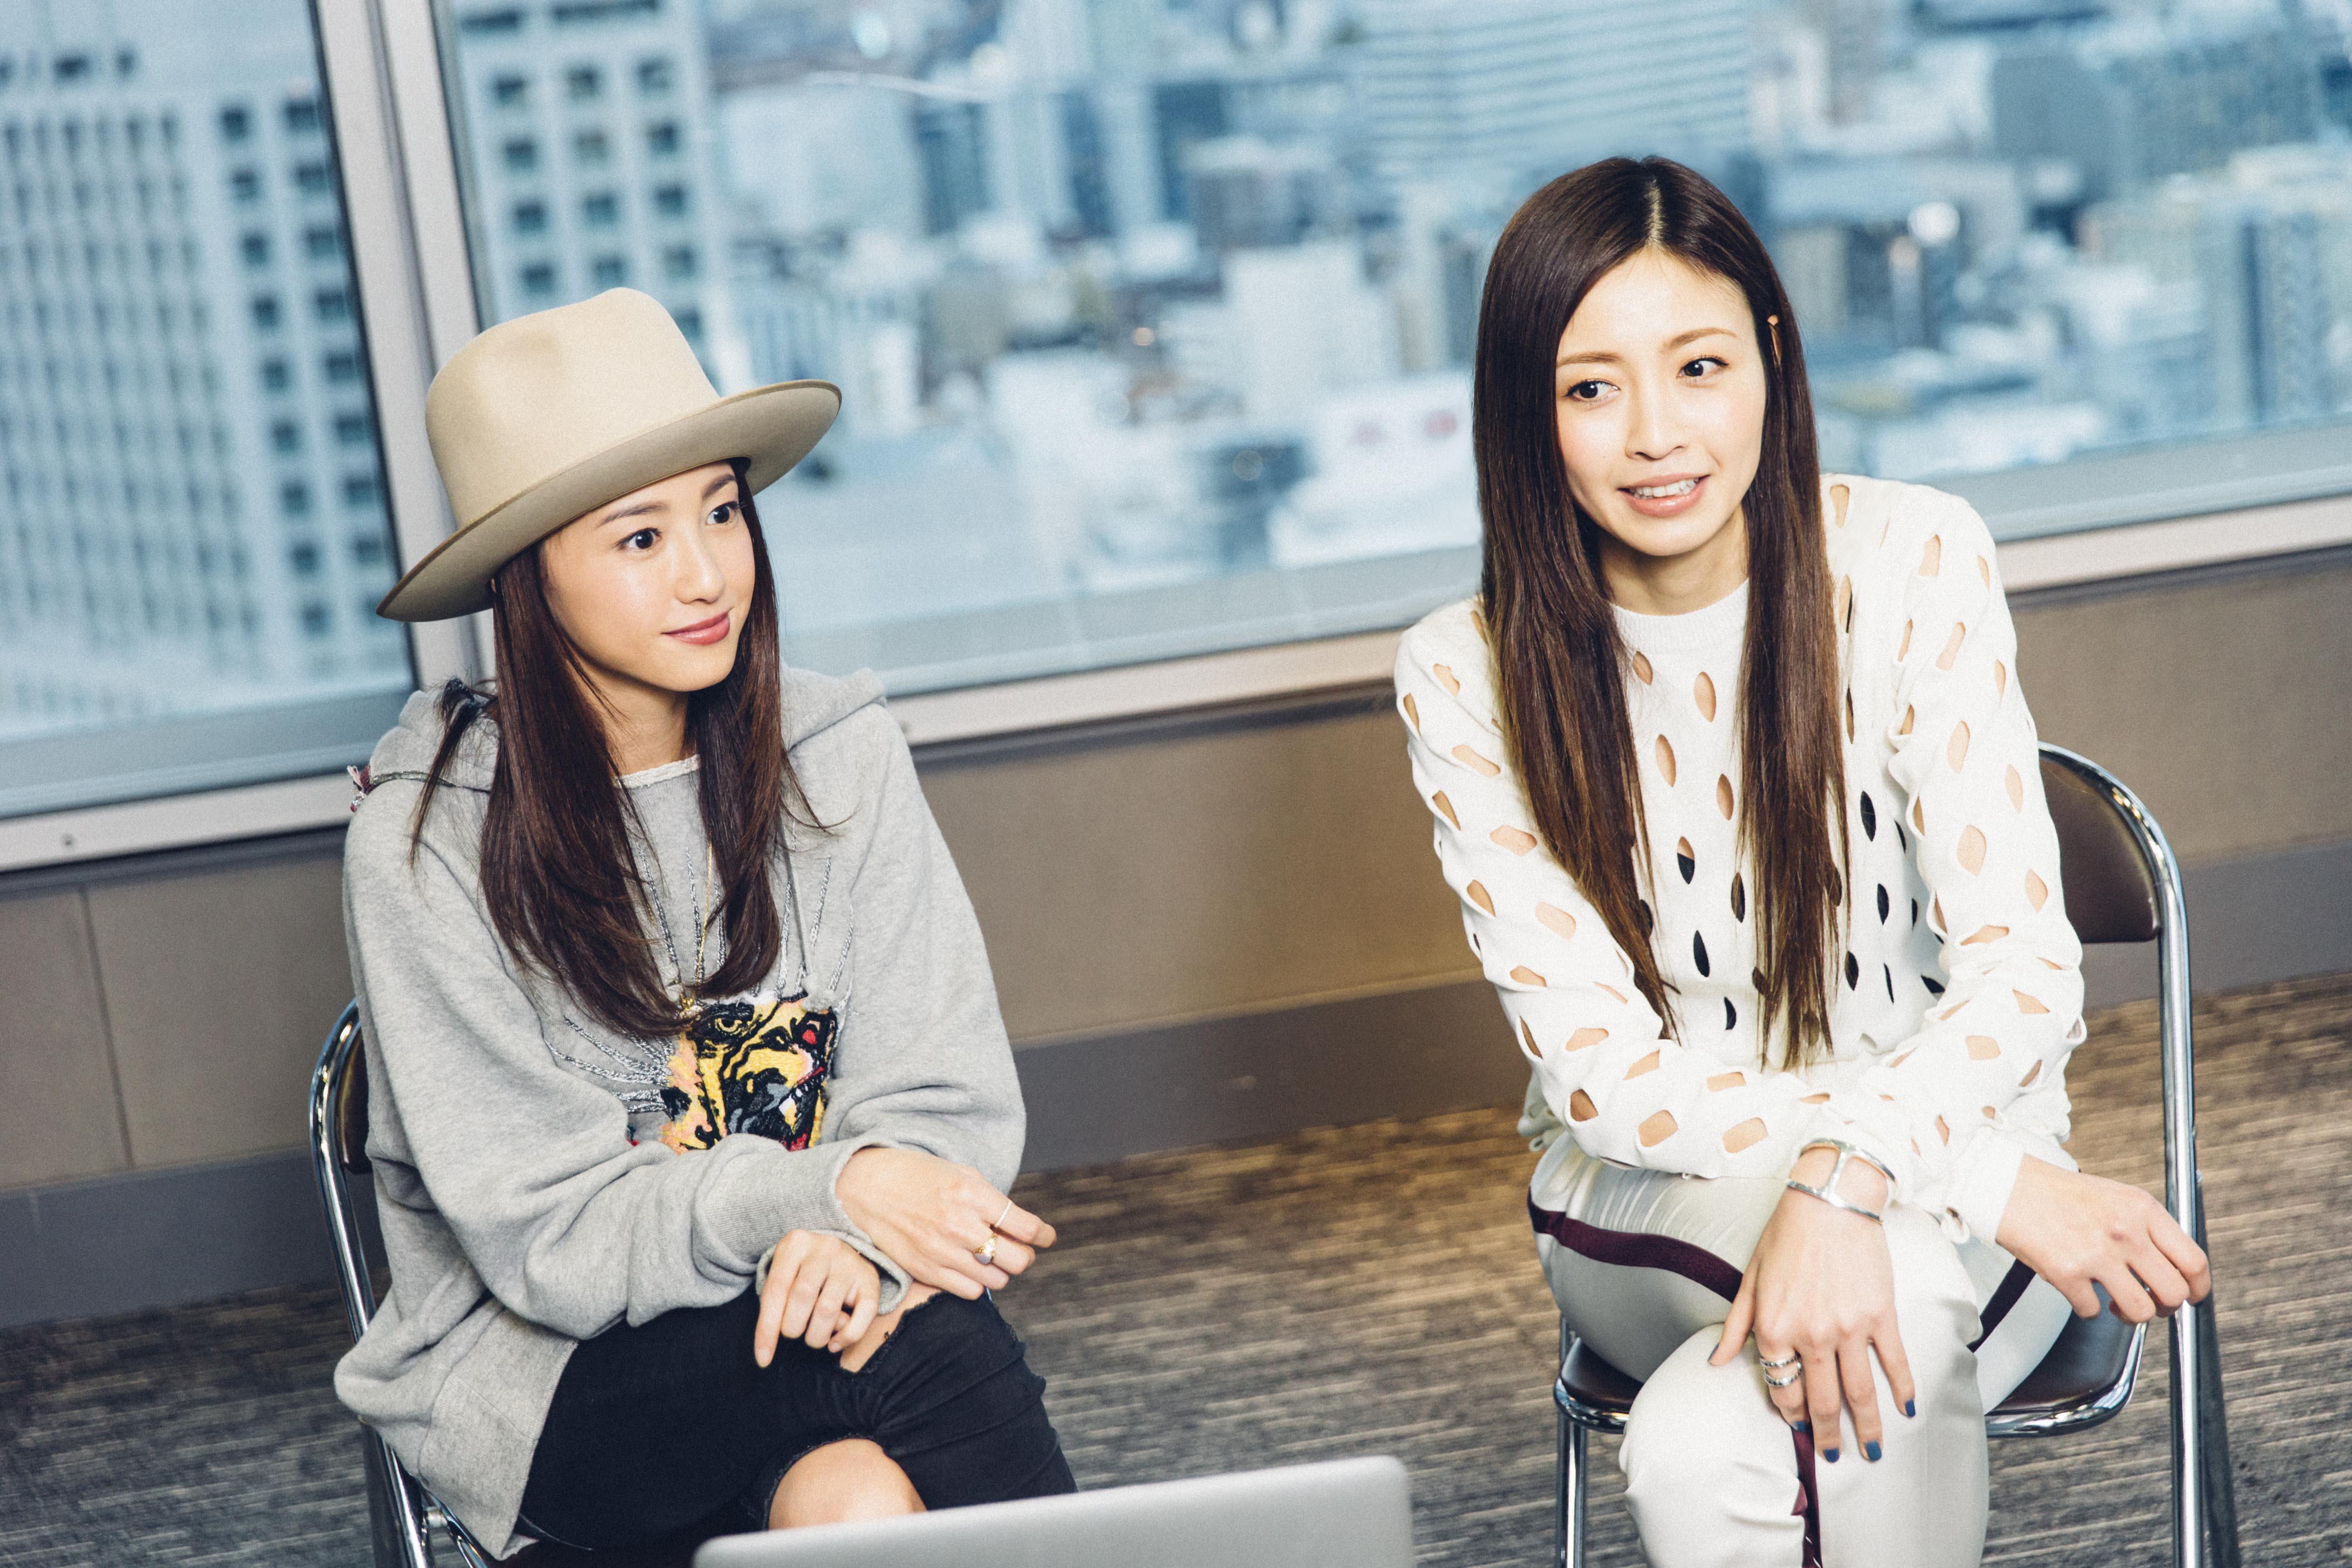 F7Q0649-1 片瀬那奈×沢尻エリカ、フジロック女子対談インタビュー!2人のフジ必需品や今年楽しみなアーティストは?